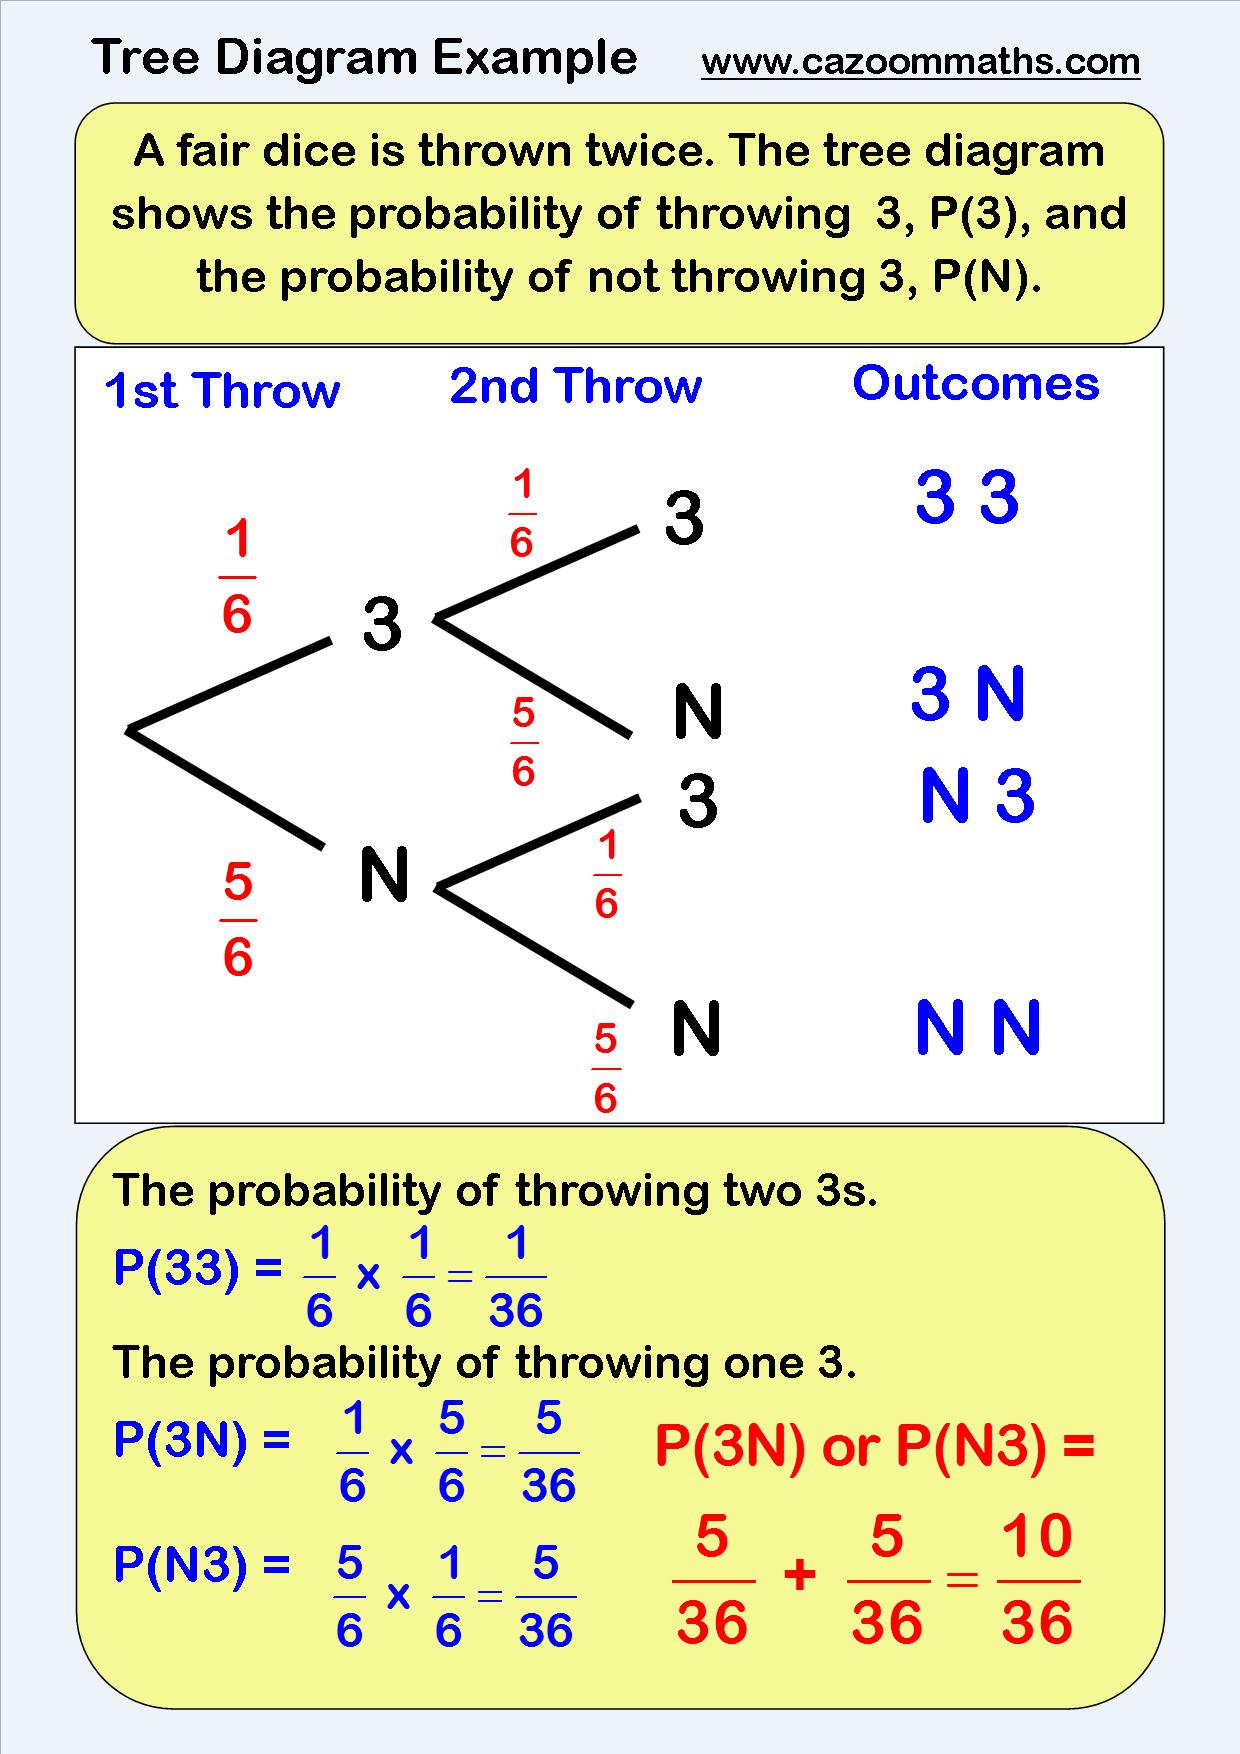 7th Grade Probability Tree Diagram Worksheet